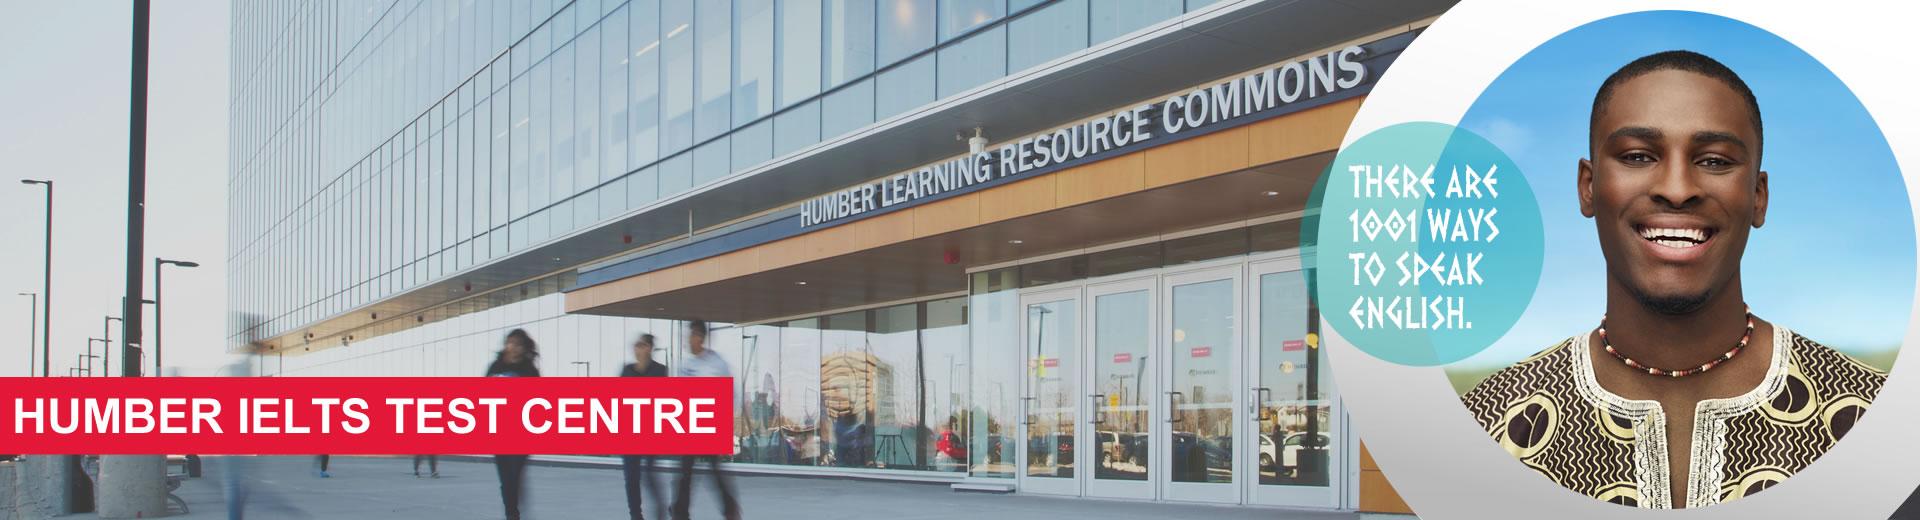 Humber IELTS Test Centre